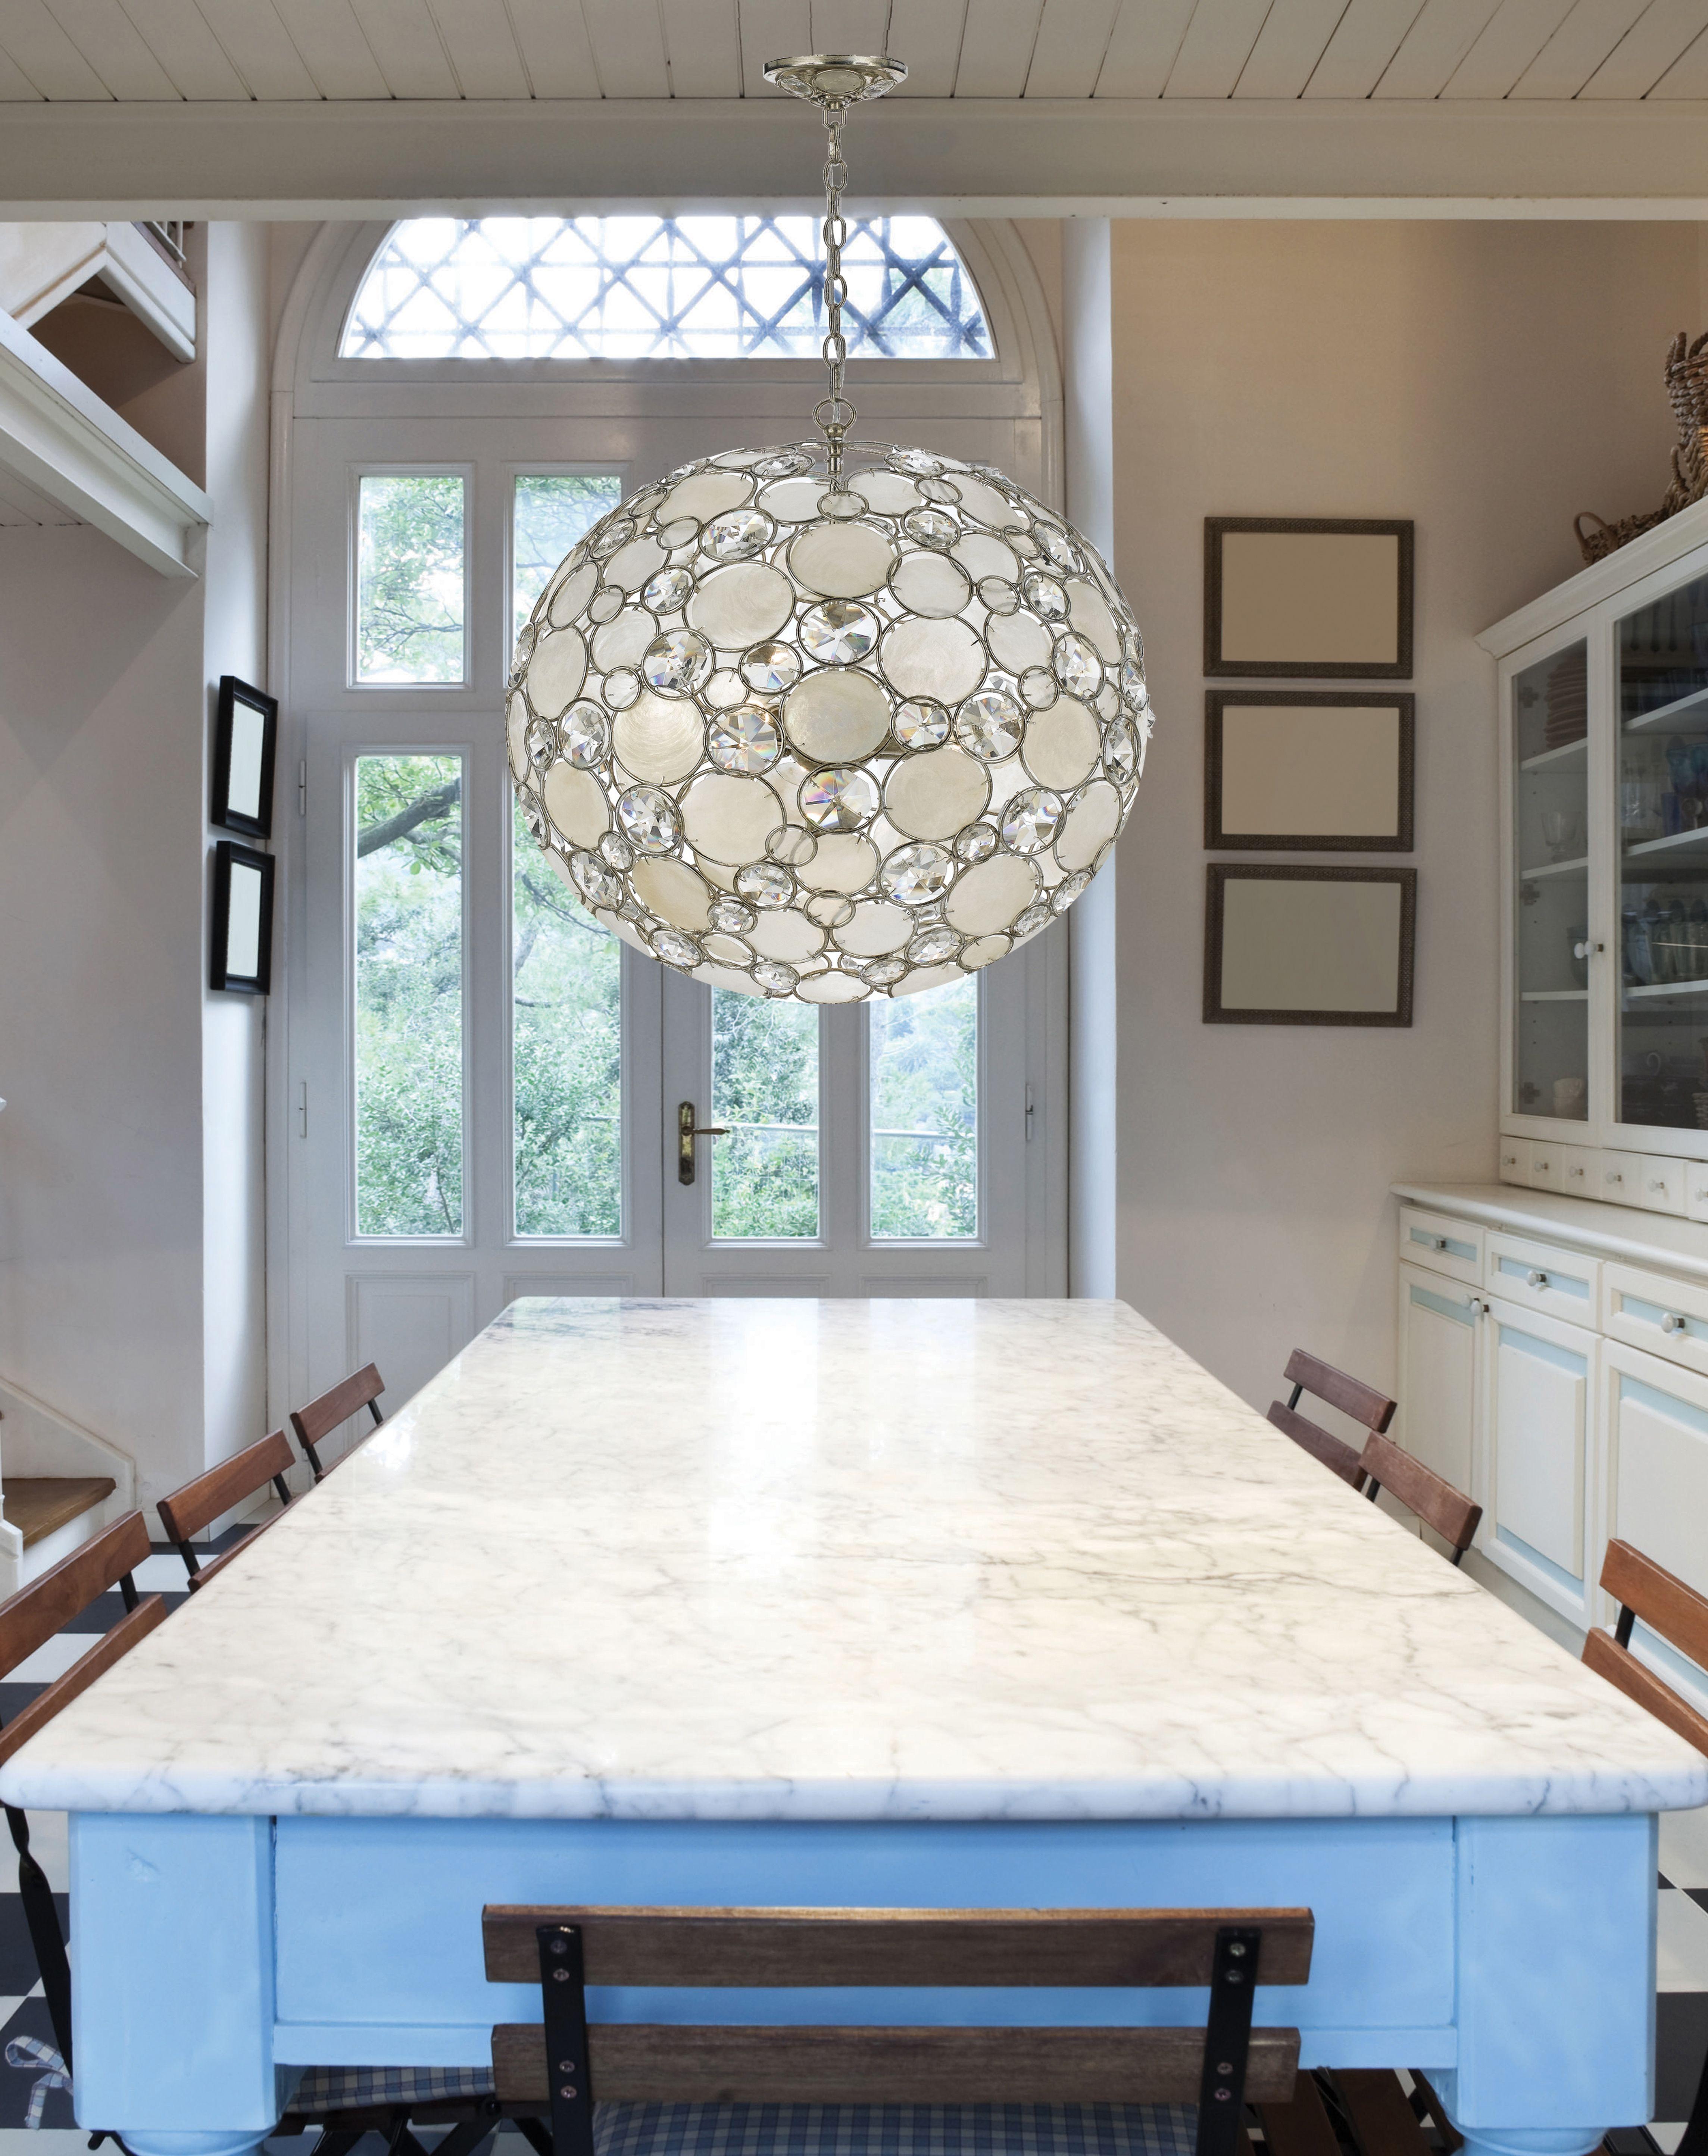 Soft interior lighting by stylish capiz chandelier rectangular soft interior lighting by stylish capiz chandelier rectangular granite dining table with cool capiz chandelier arubaitofo Choice Image